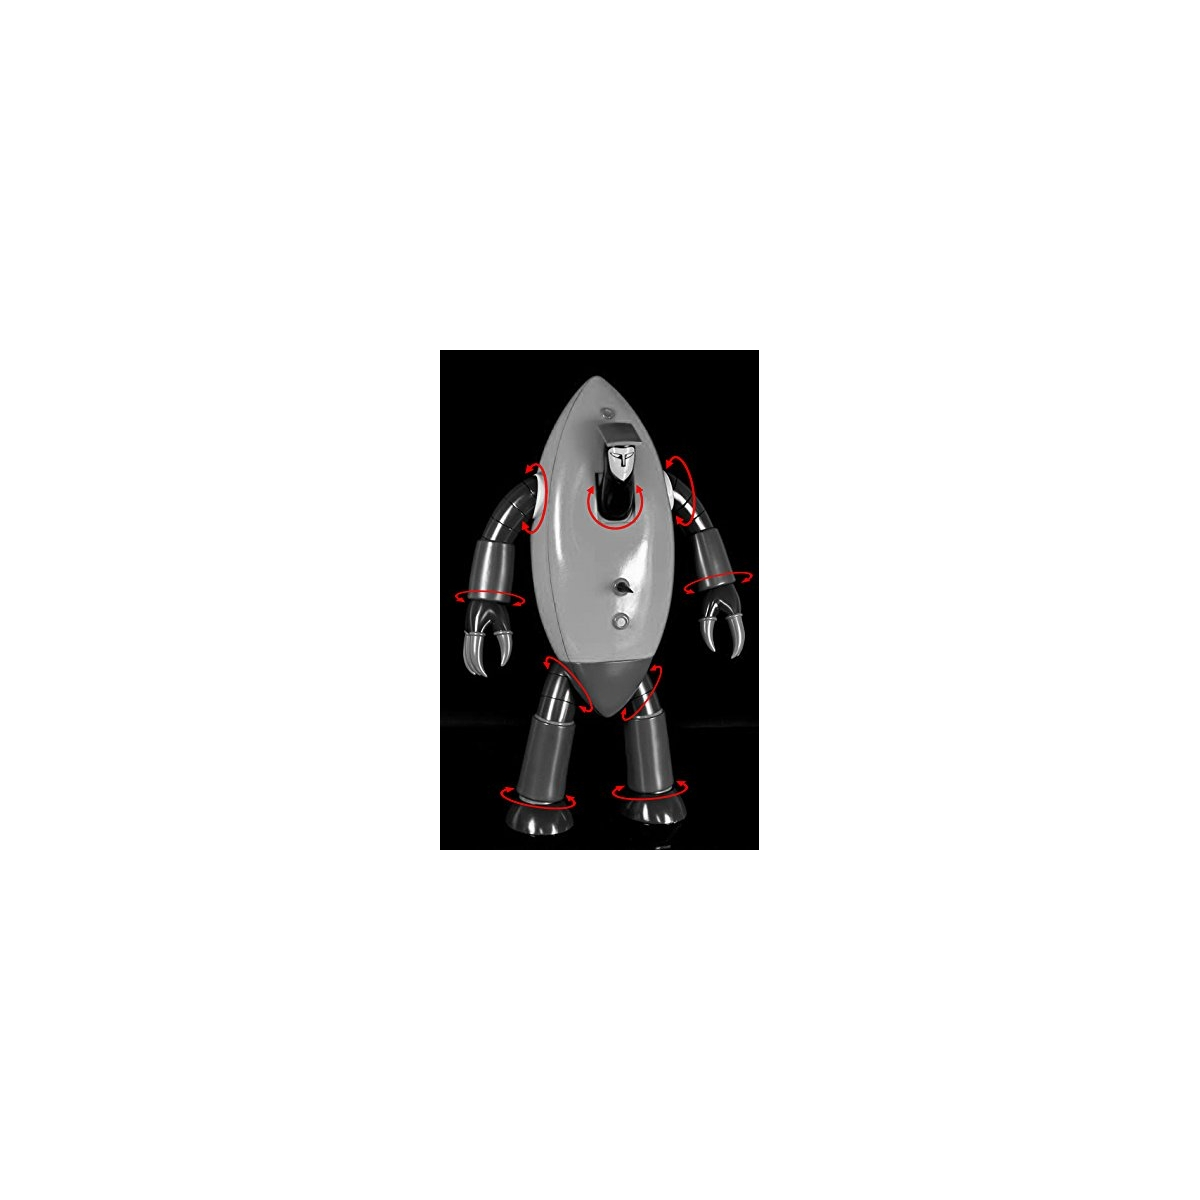 Dragon Ball MIGHTY MASK gomma//plastica morbida misura cm 5,7